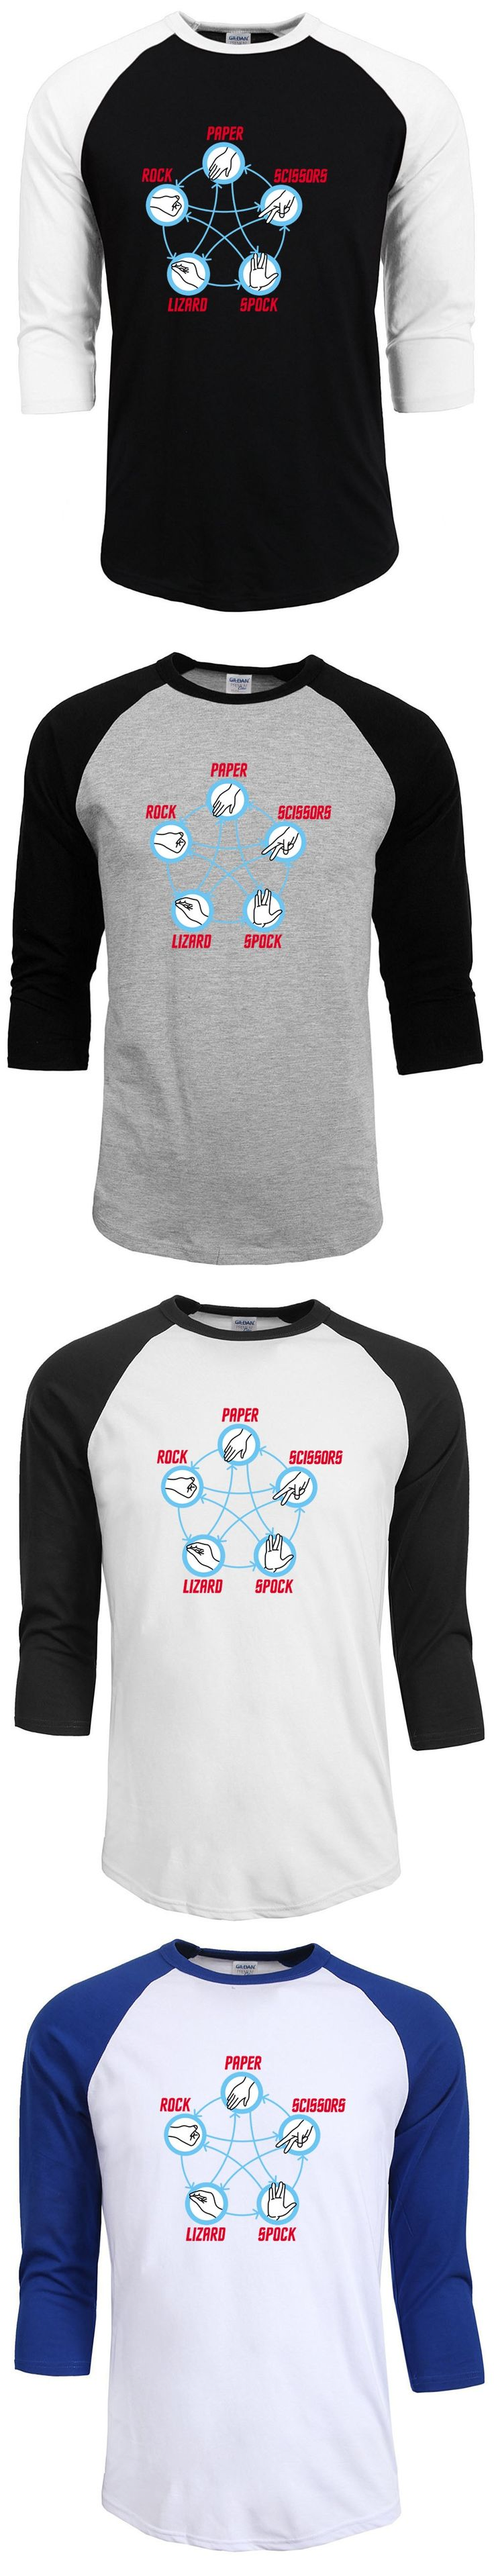 2017 new fashion star Trek Rock Paper Scissors Lizard Spock funny print T-Shirt men t shirts male top streetwear tops clothing